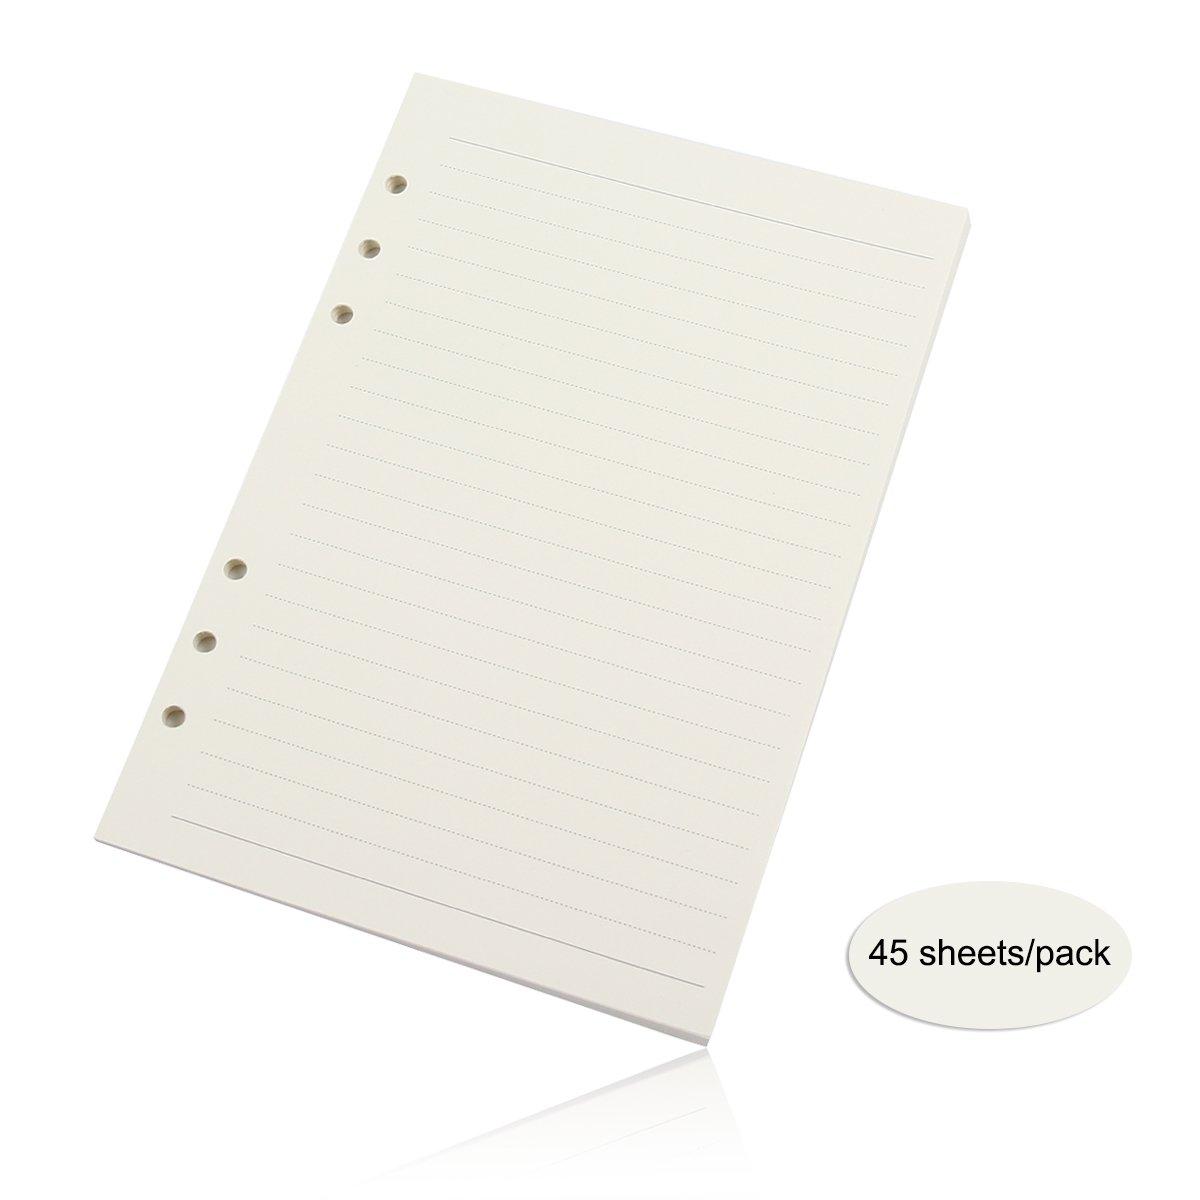 Evilandat 3 Packs of Refills Paper 6 Holes A6 17.2 x 9.5CM for Binder Loose Leaf Notebook Planner, 45 Sheets/ 90 Pages Per Pack, Blank White Paper